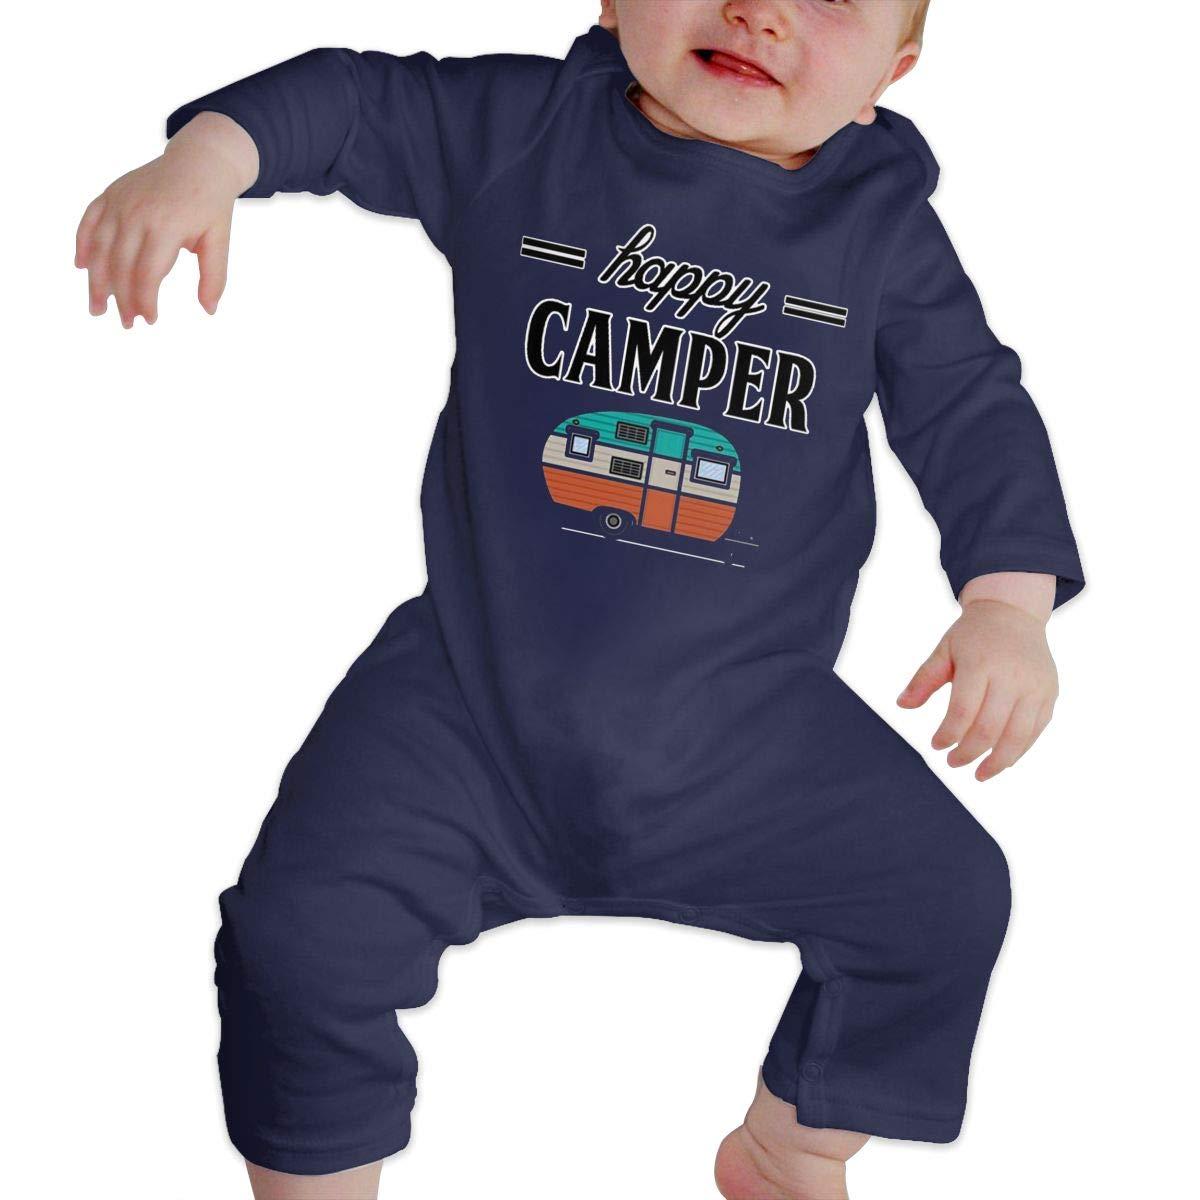 SININIDR Newborn Jumpsuit Infant Baby Girls Happy Camper Long-Sleeve Bodysuit Playsuit Outfits Clothes Black